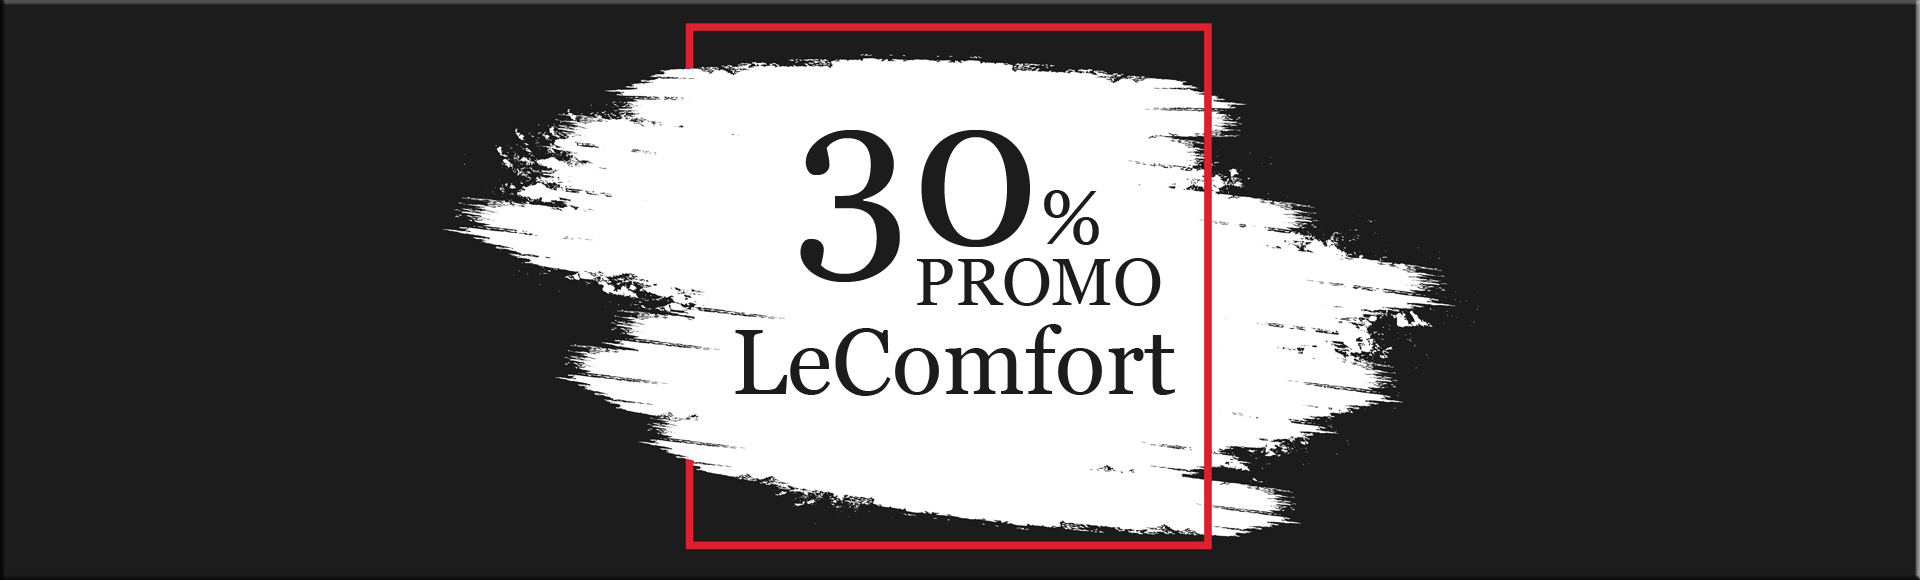 Banner 30% LeComfort